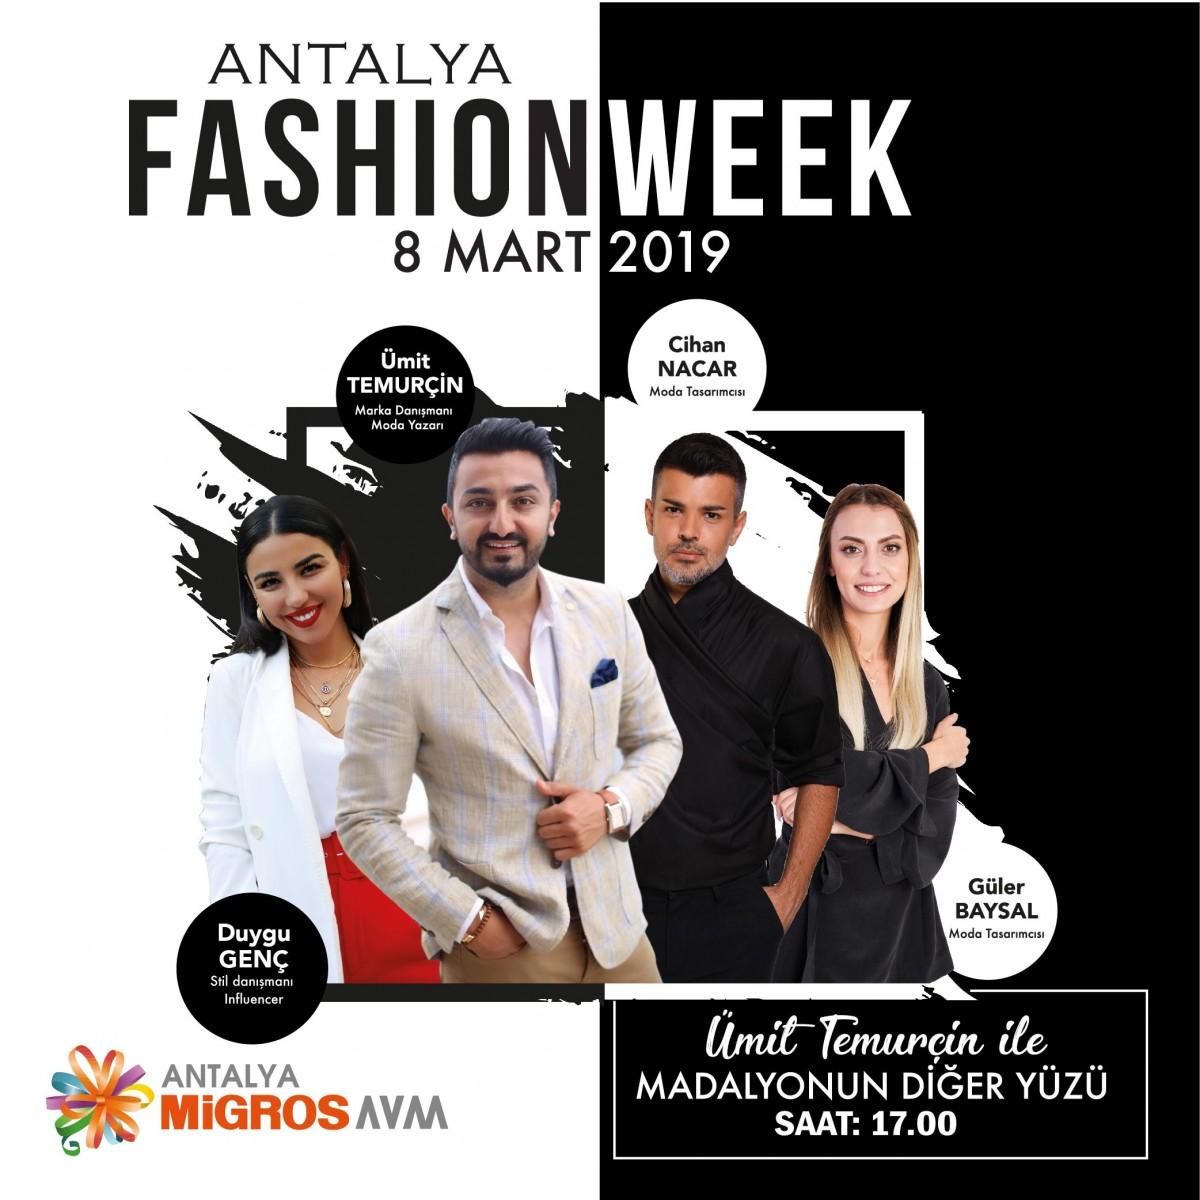 Antalya FashionWeek